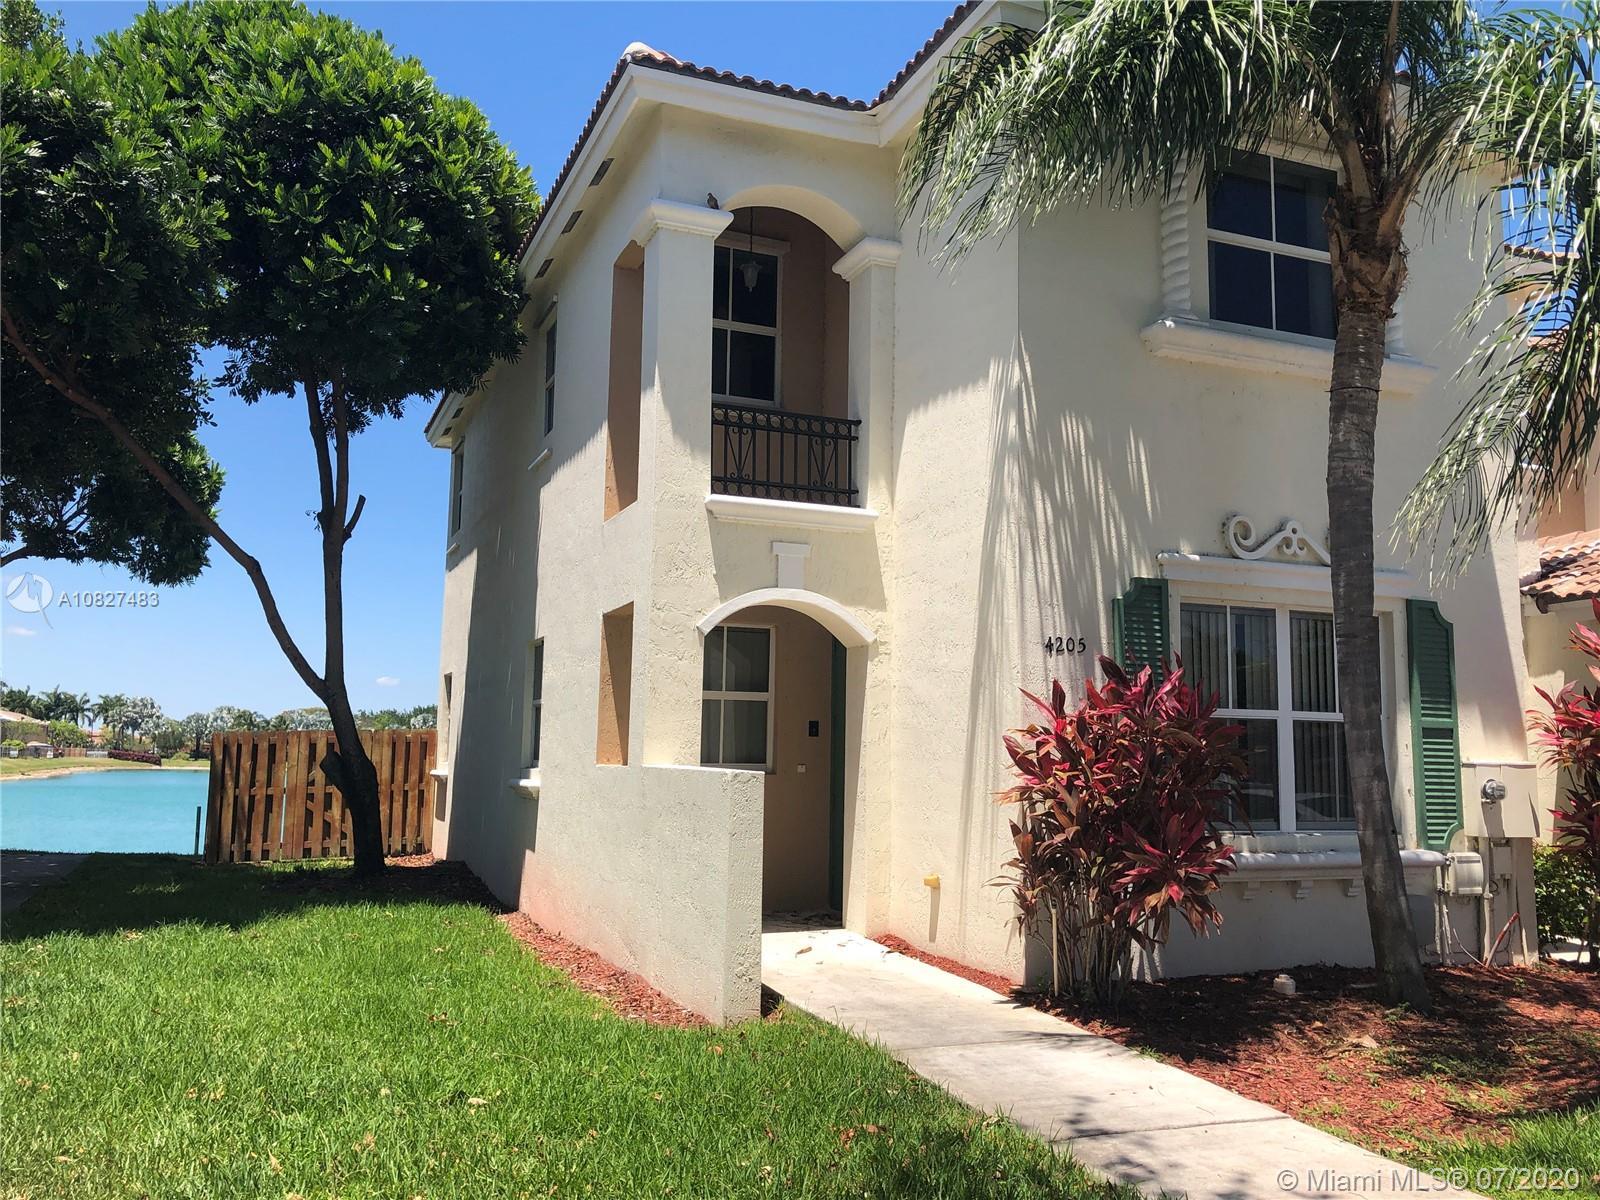 4205 NE 9th St #4205, Homestead, FL 33033 - Homestead, FL real estate listing